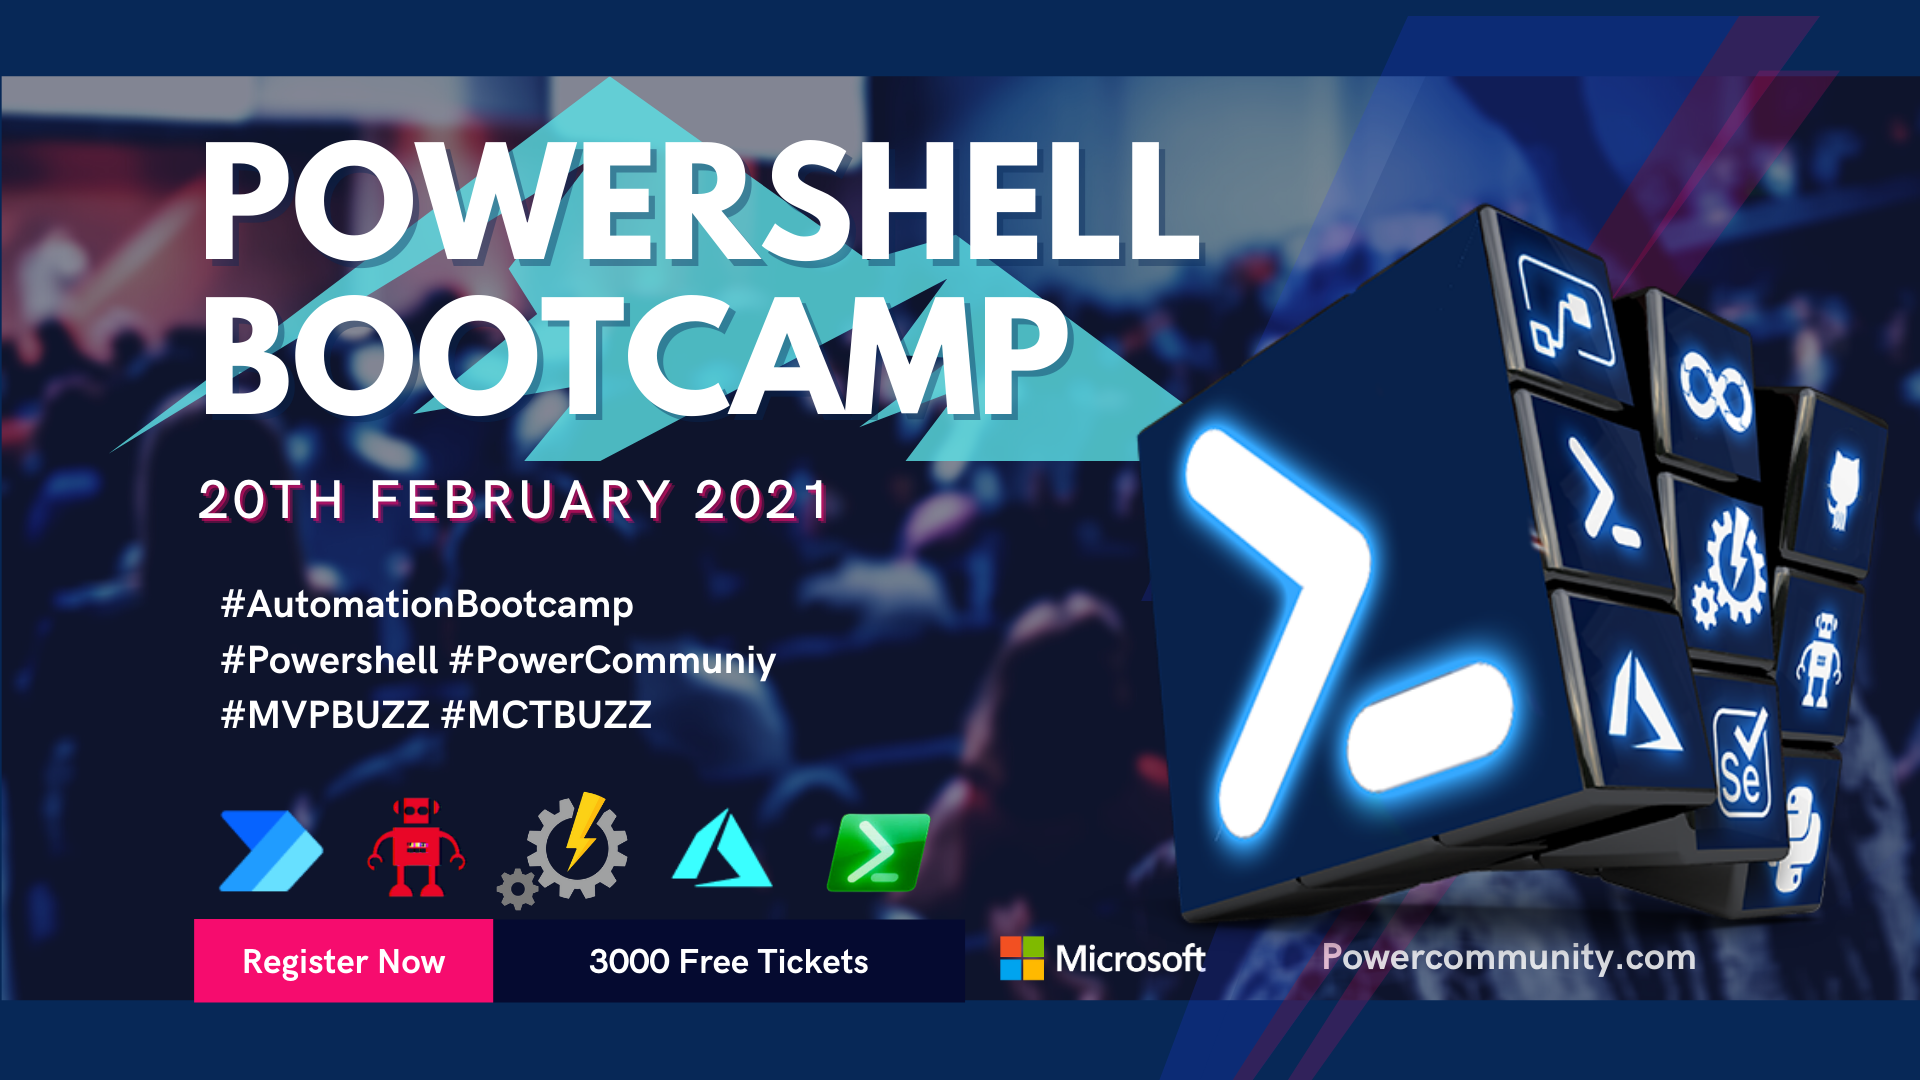 Powershell Bootcamp 2021